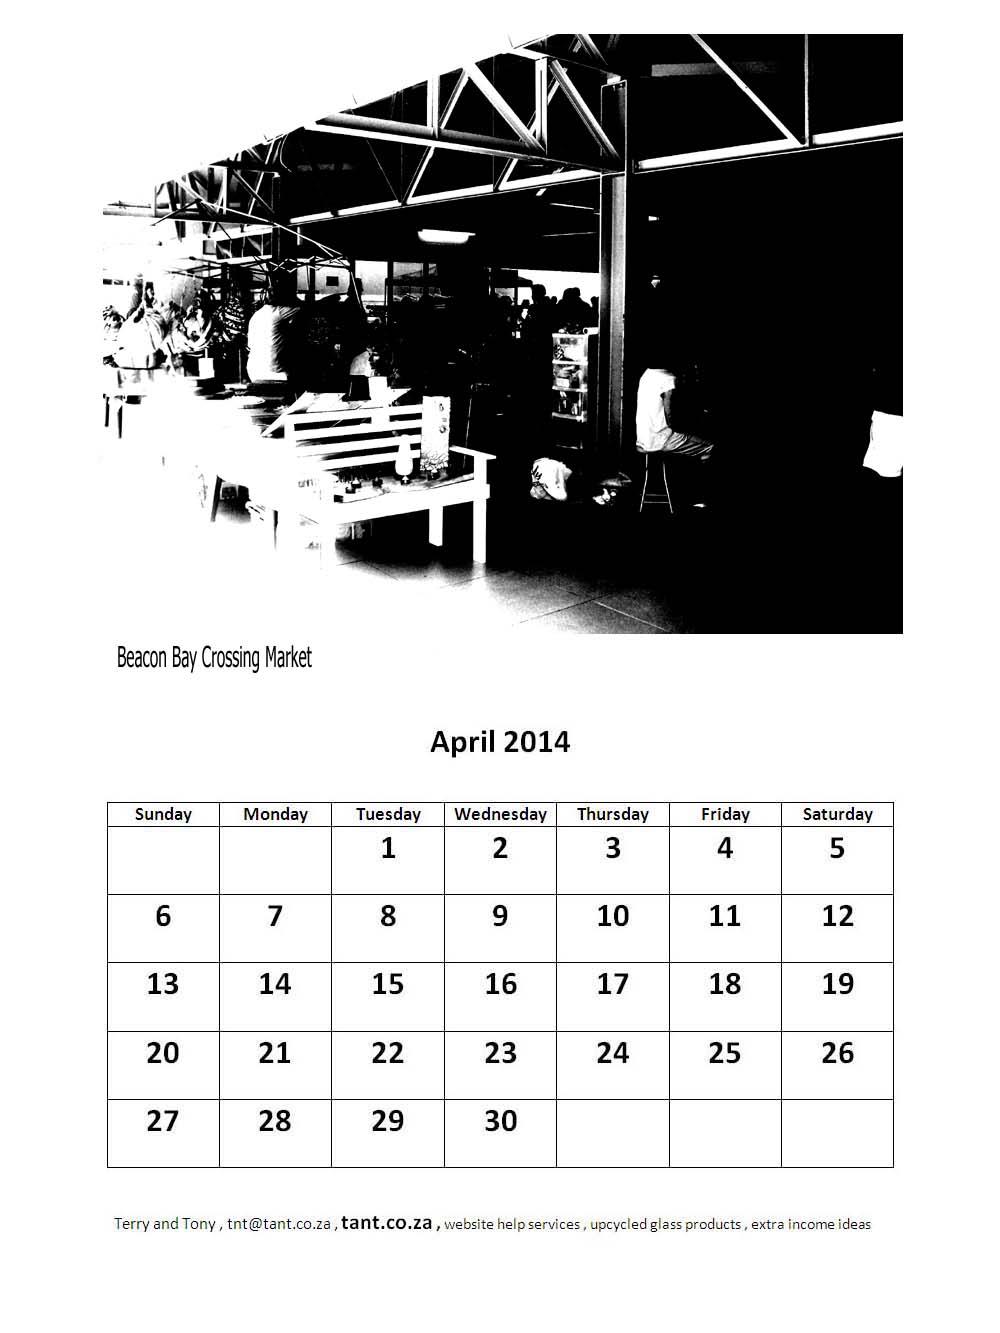 April Calendar London : Free calendar east london markets theme